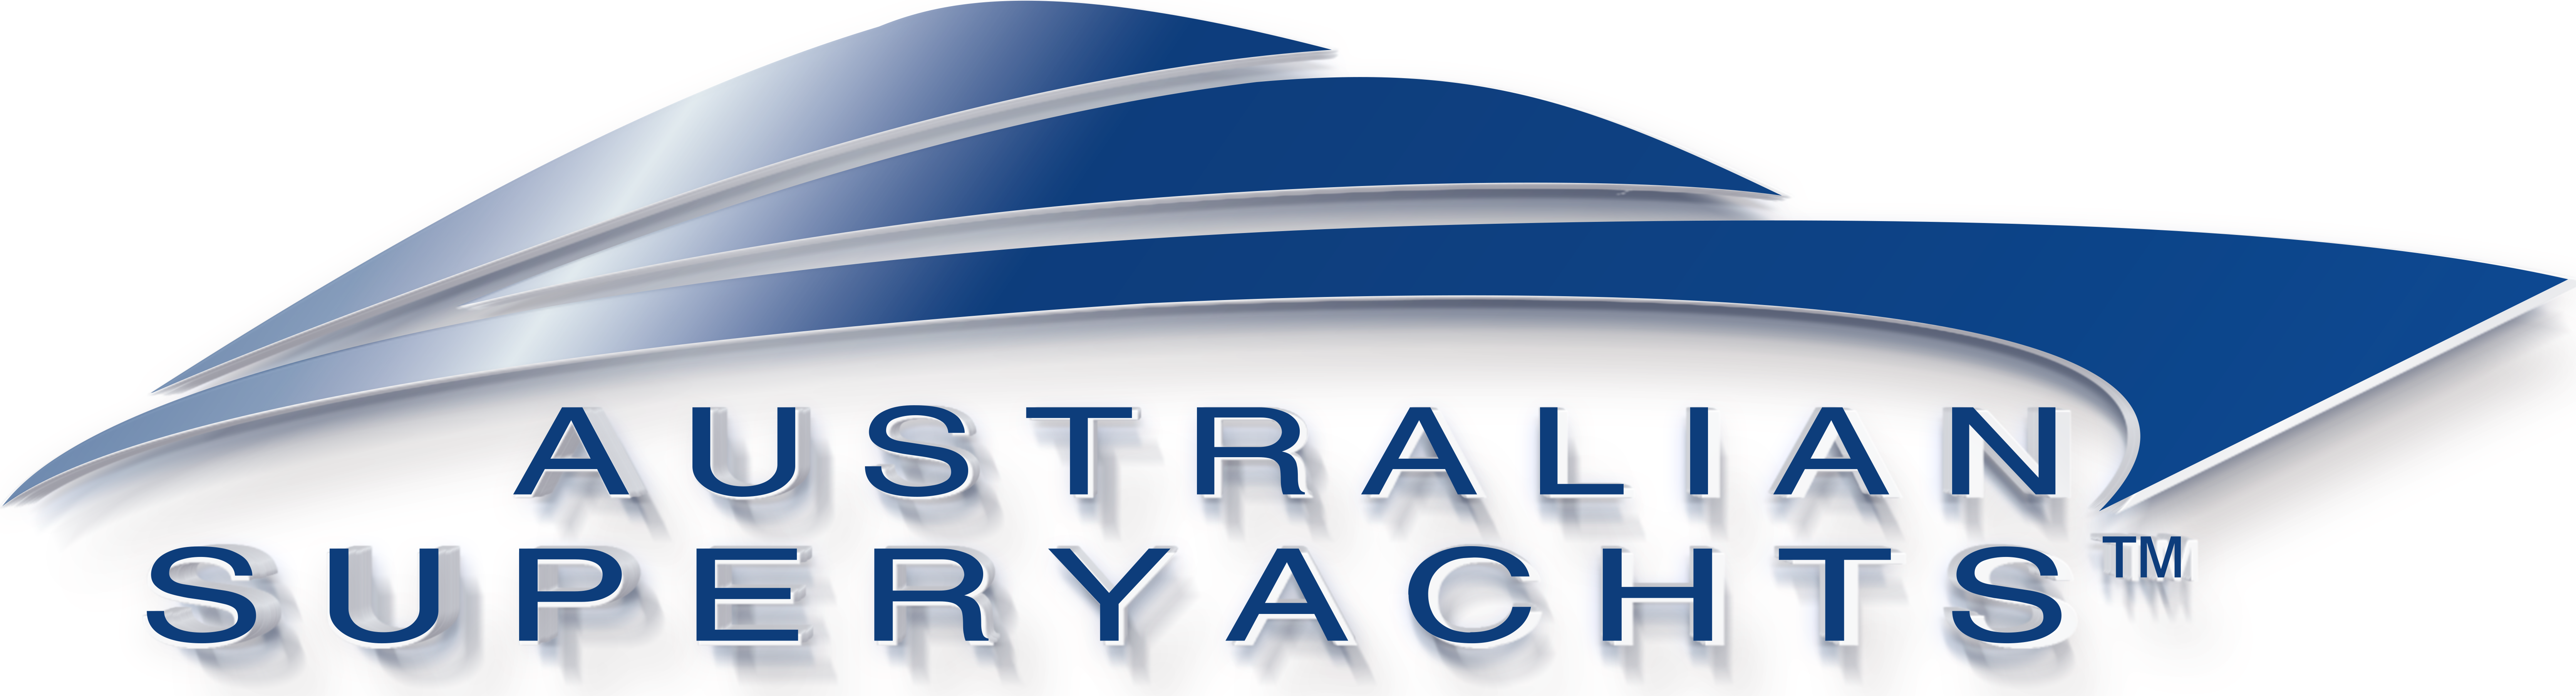 1 Australian Superyachts TM Logo 2015 XXL - white.png